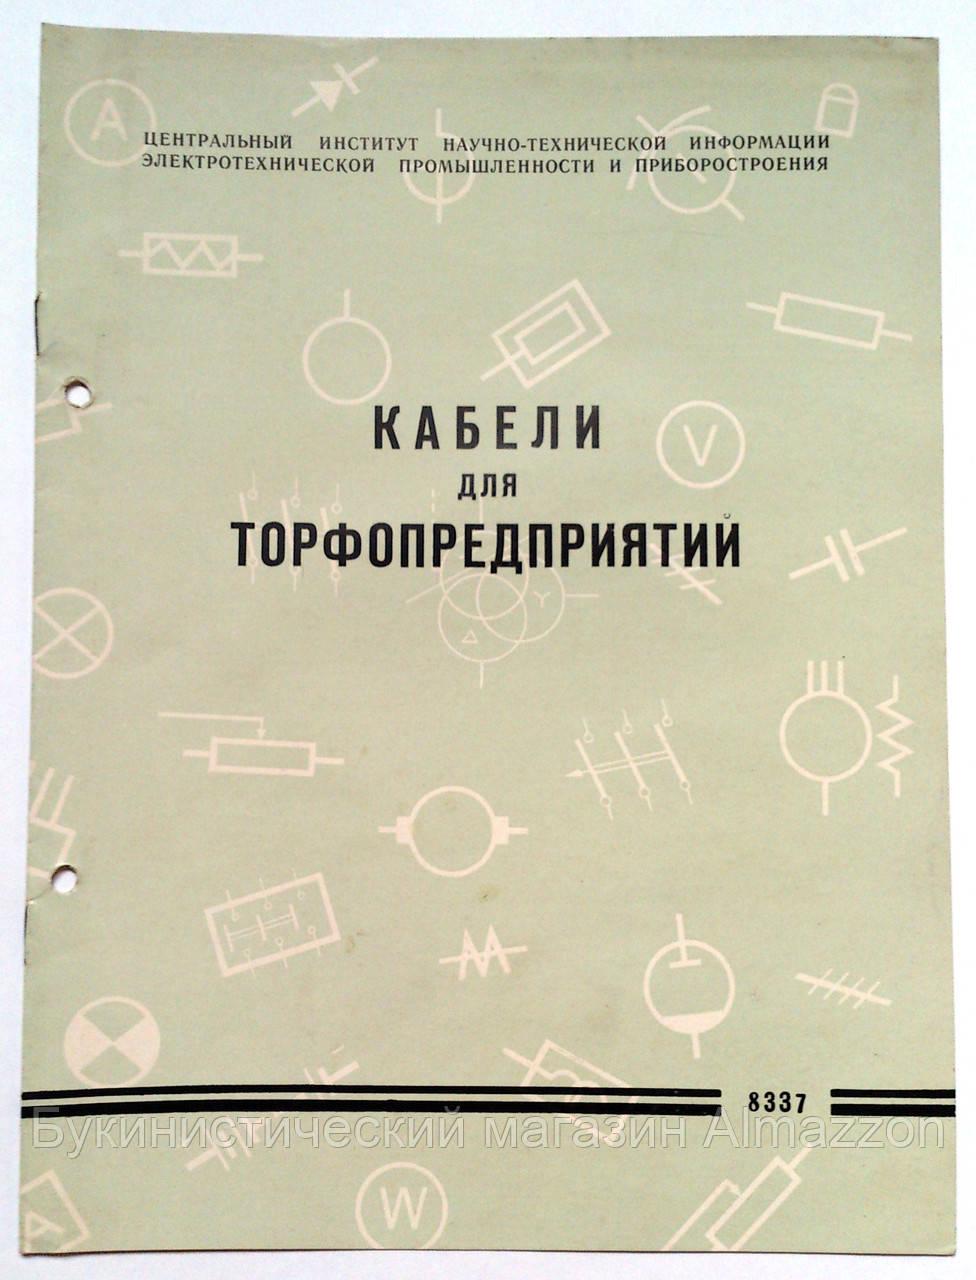 Журнал (Бюллетень) ЦИНТИ Кабели для торфопредприятий 1960 год